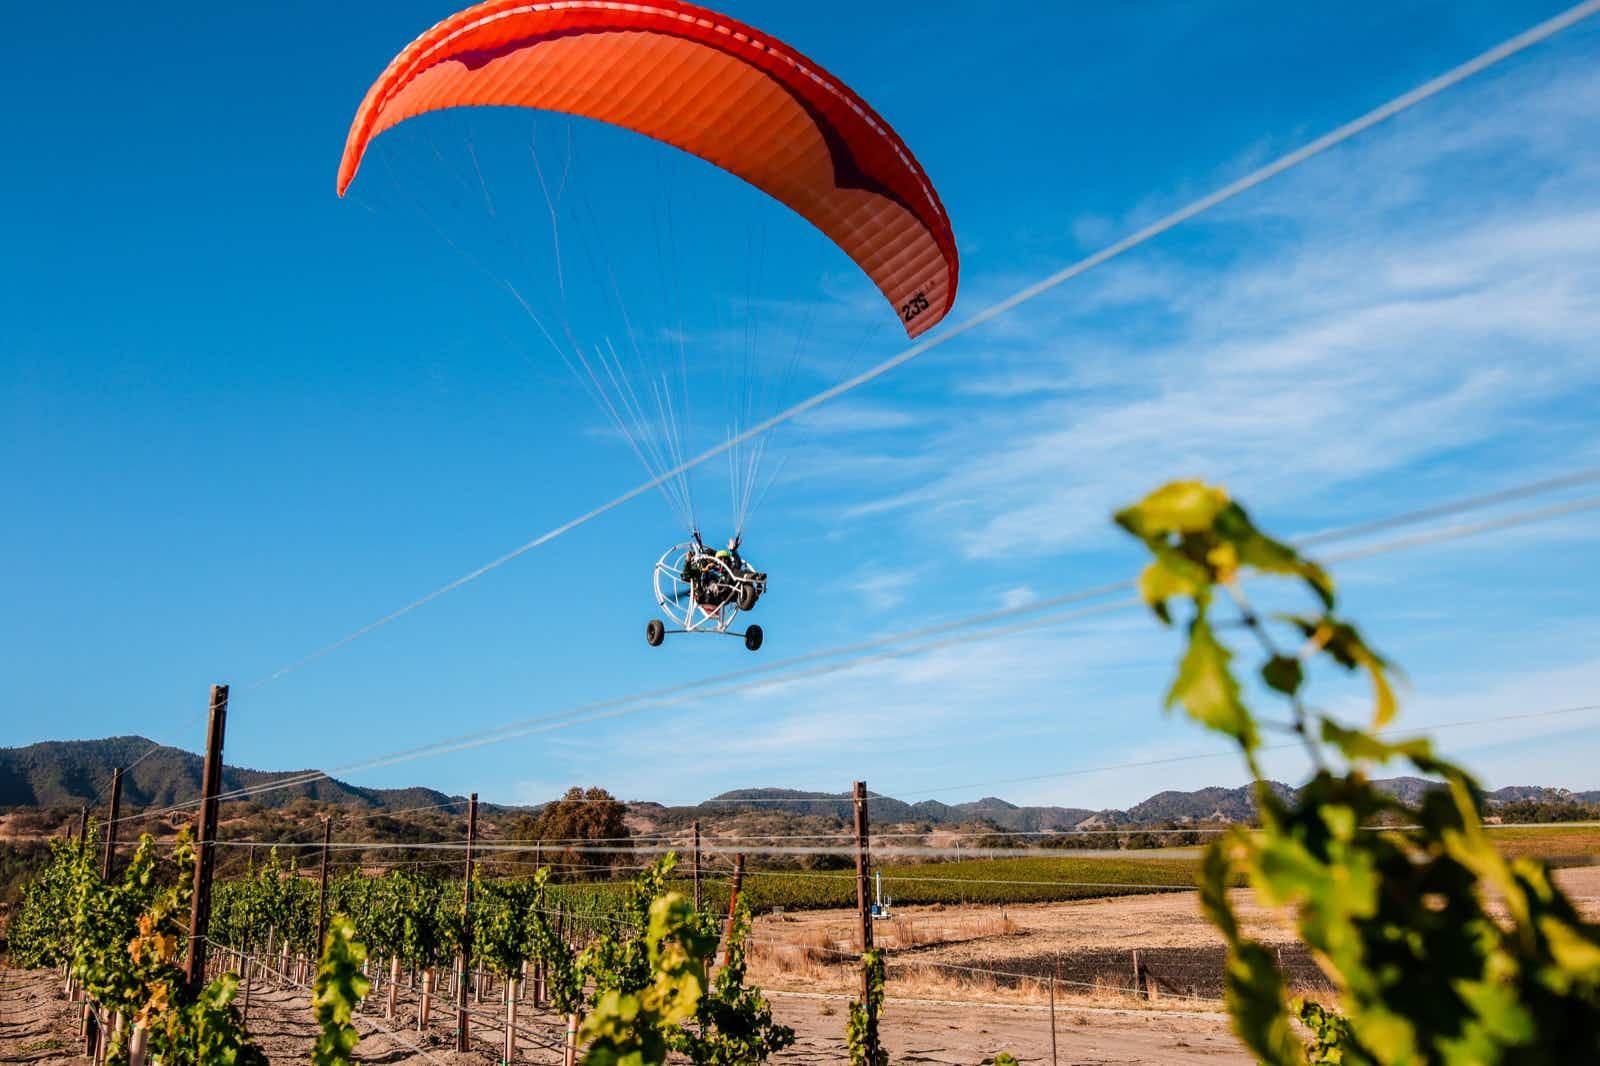 An orange parachute carries a paraglider through a blue sky above the grape vines at a vineyard in San Luis Obispo County, Calfifornia